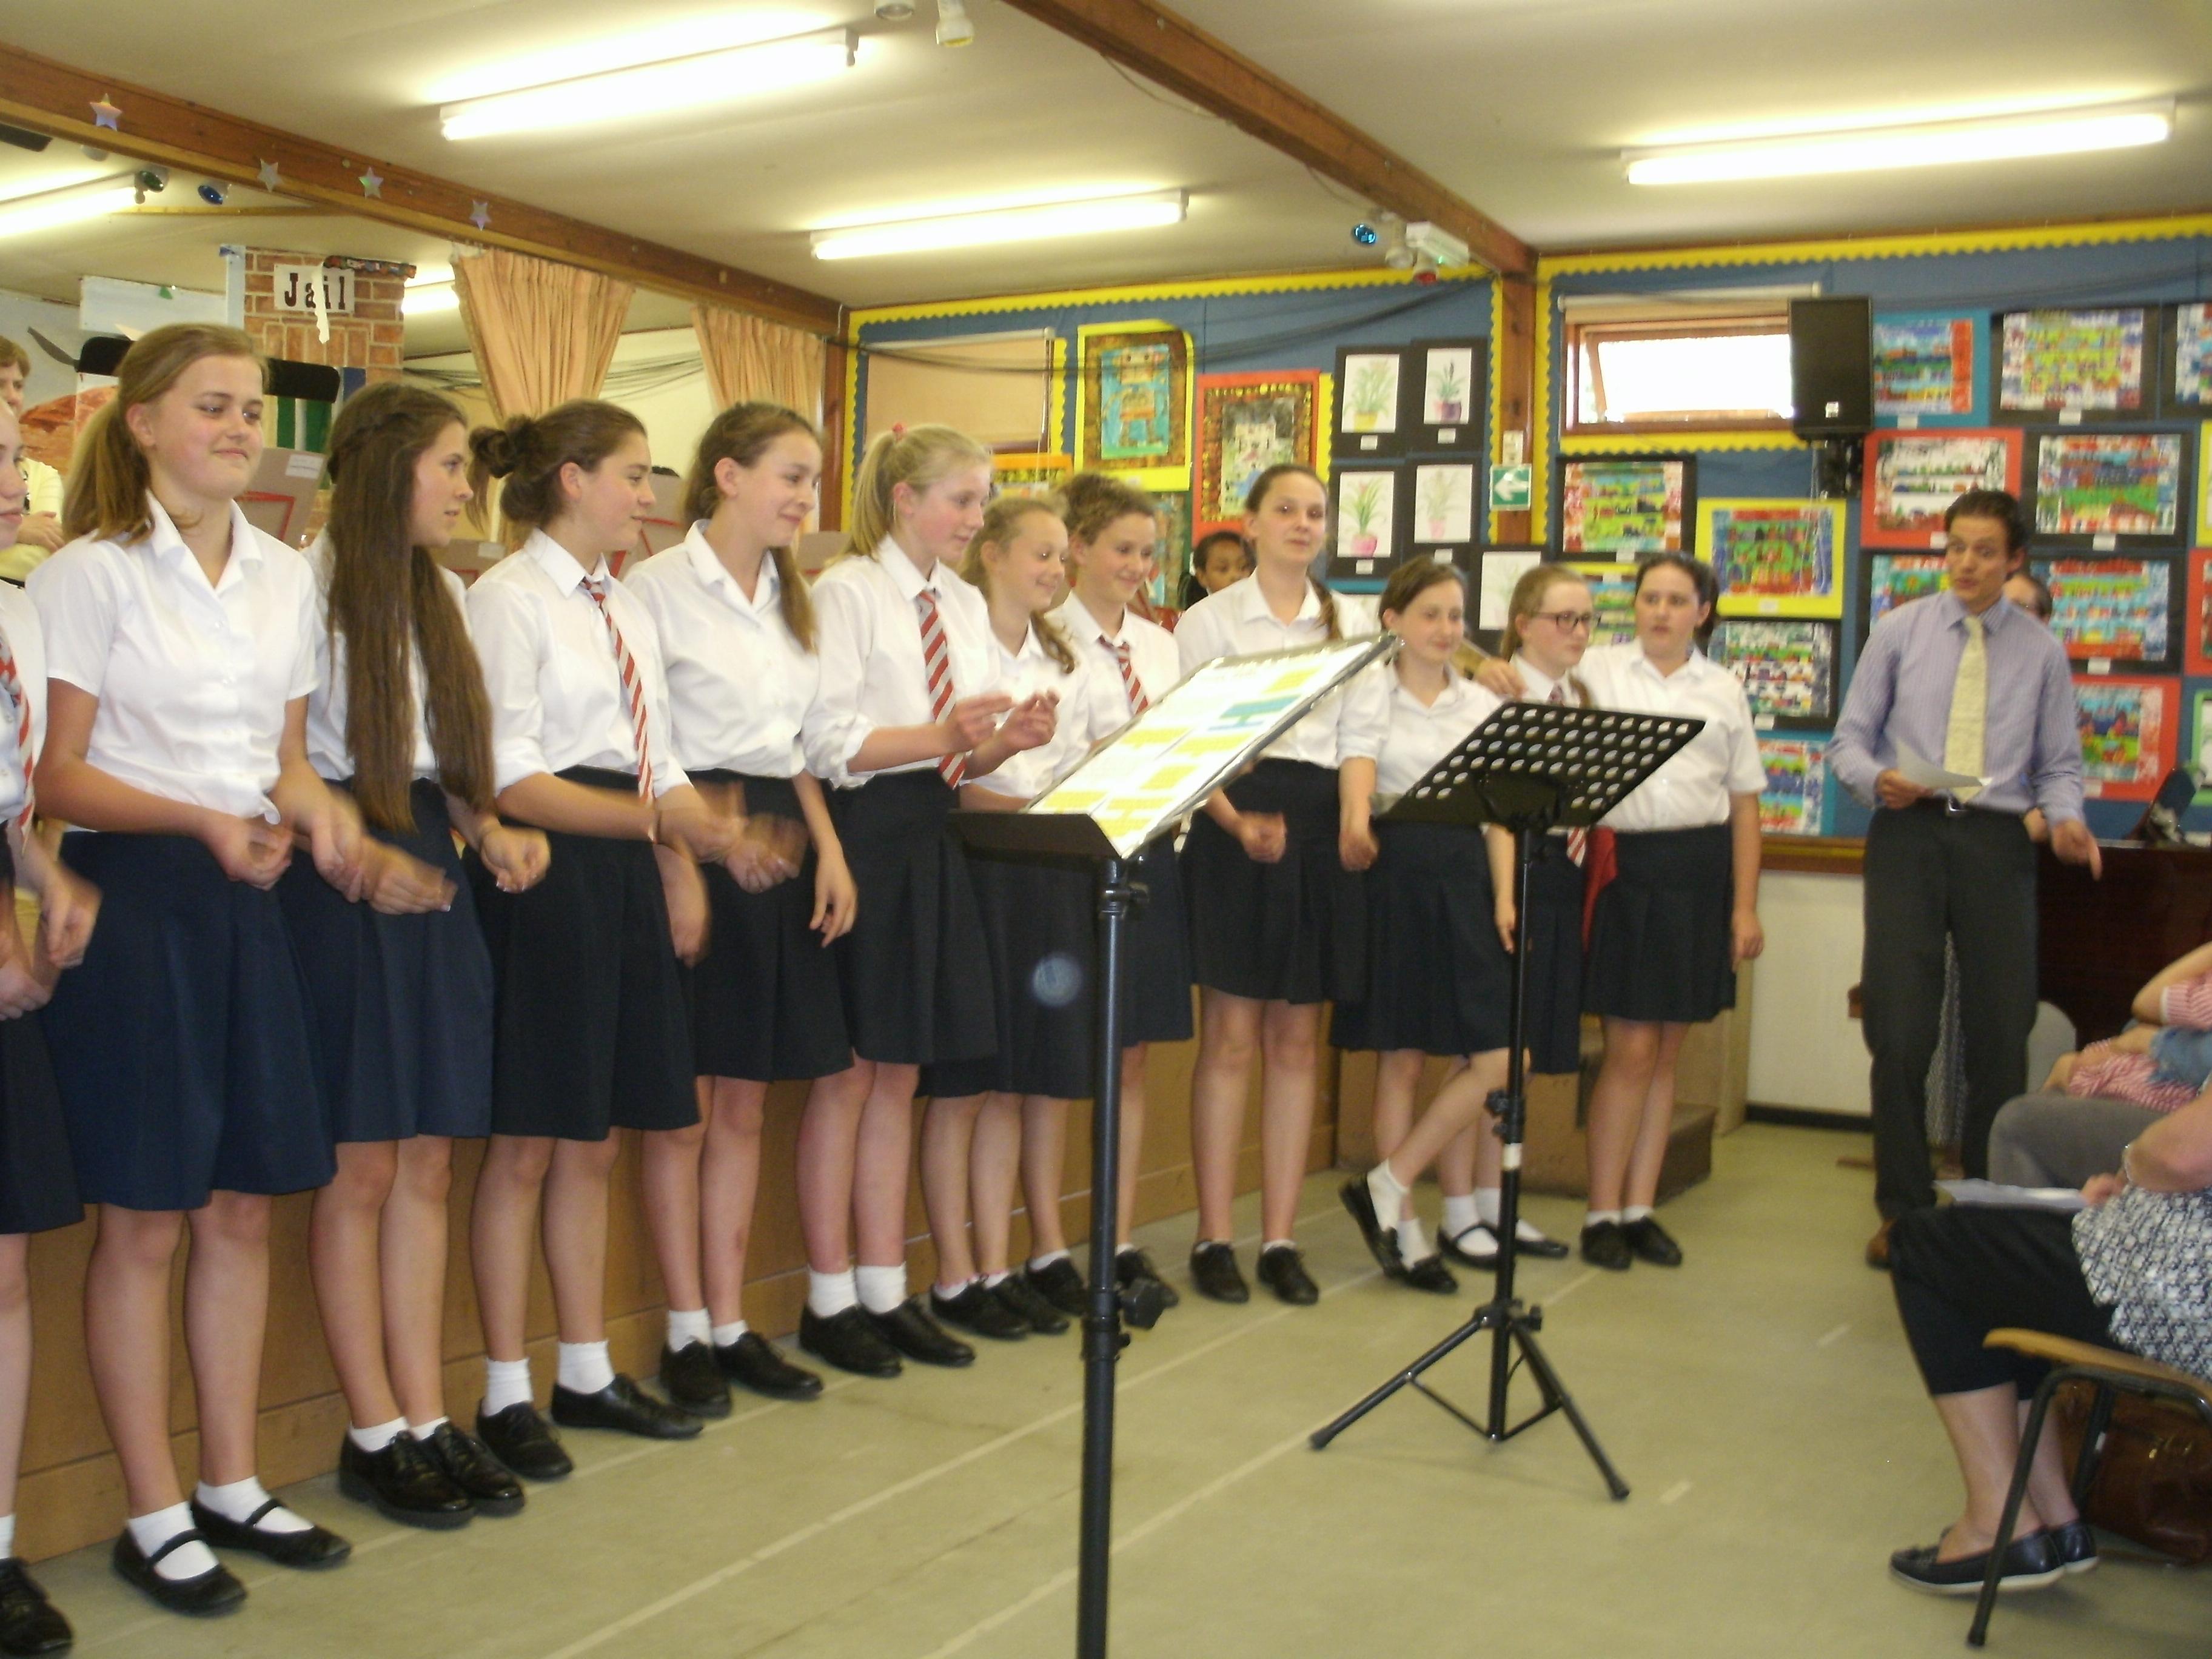 Music Stoneygate School